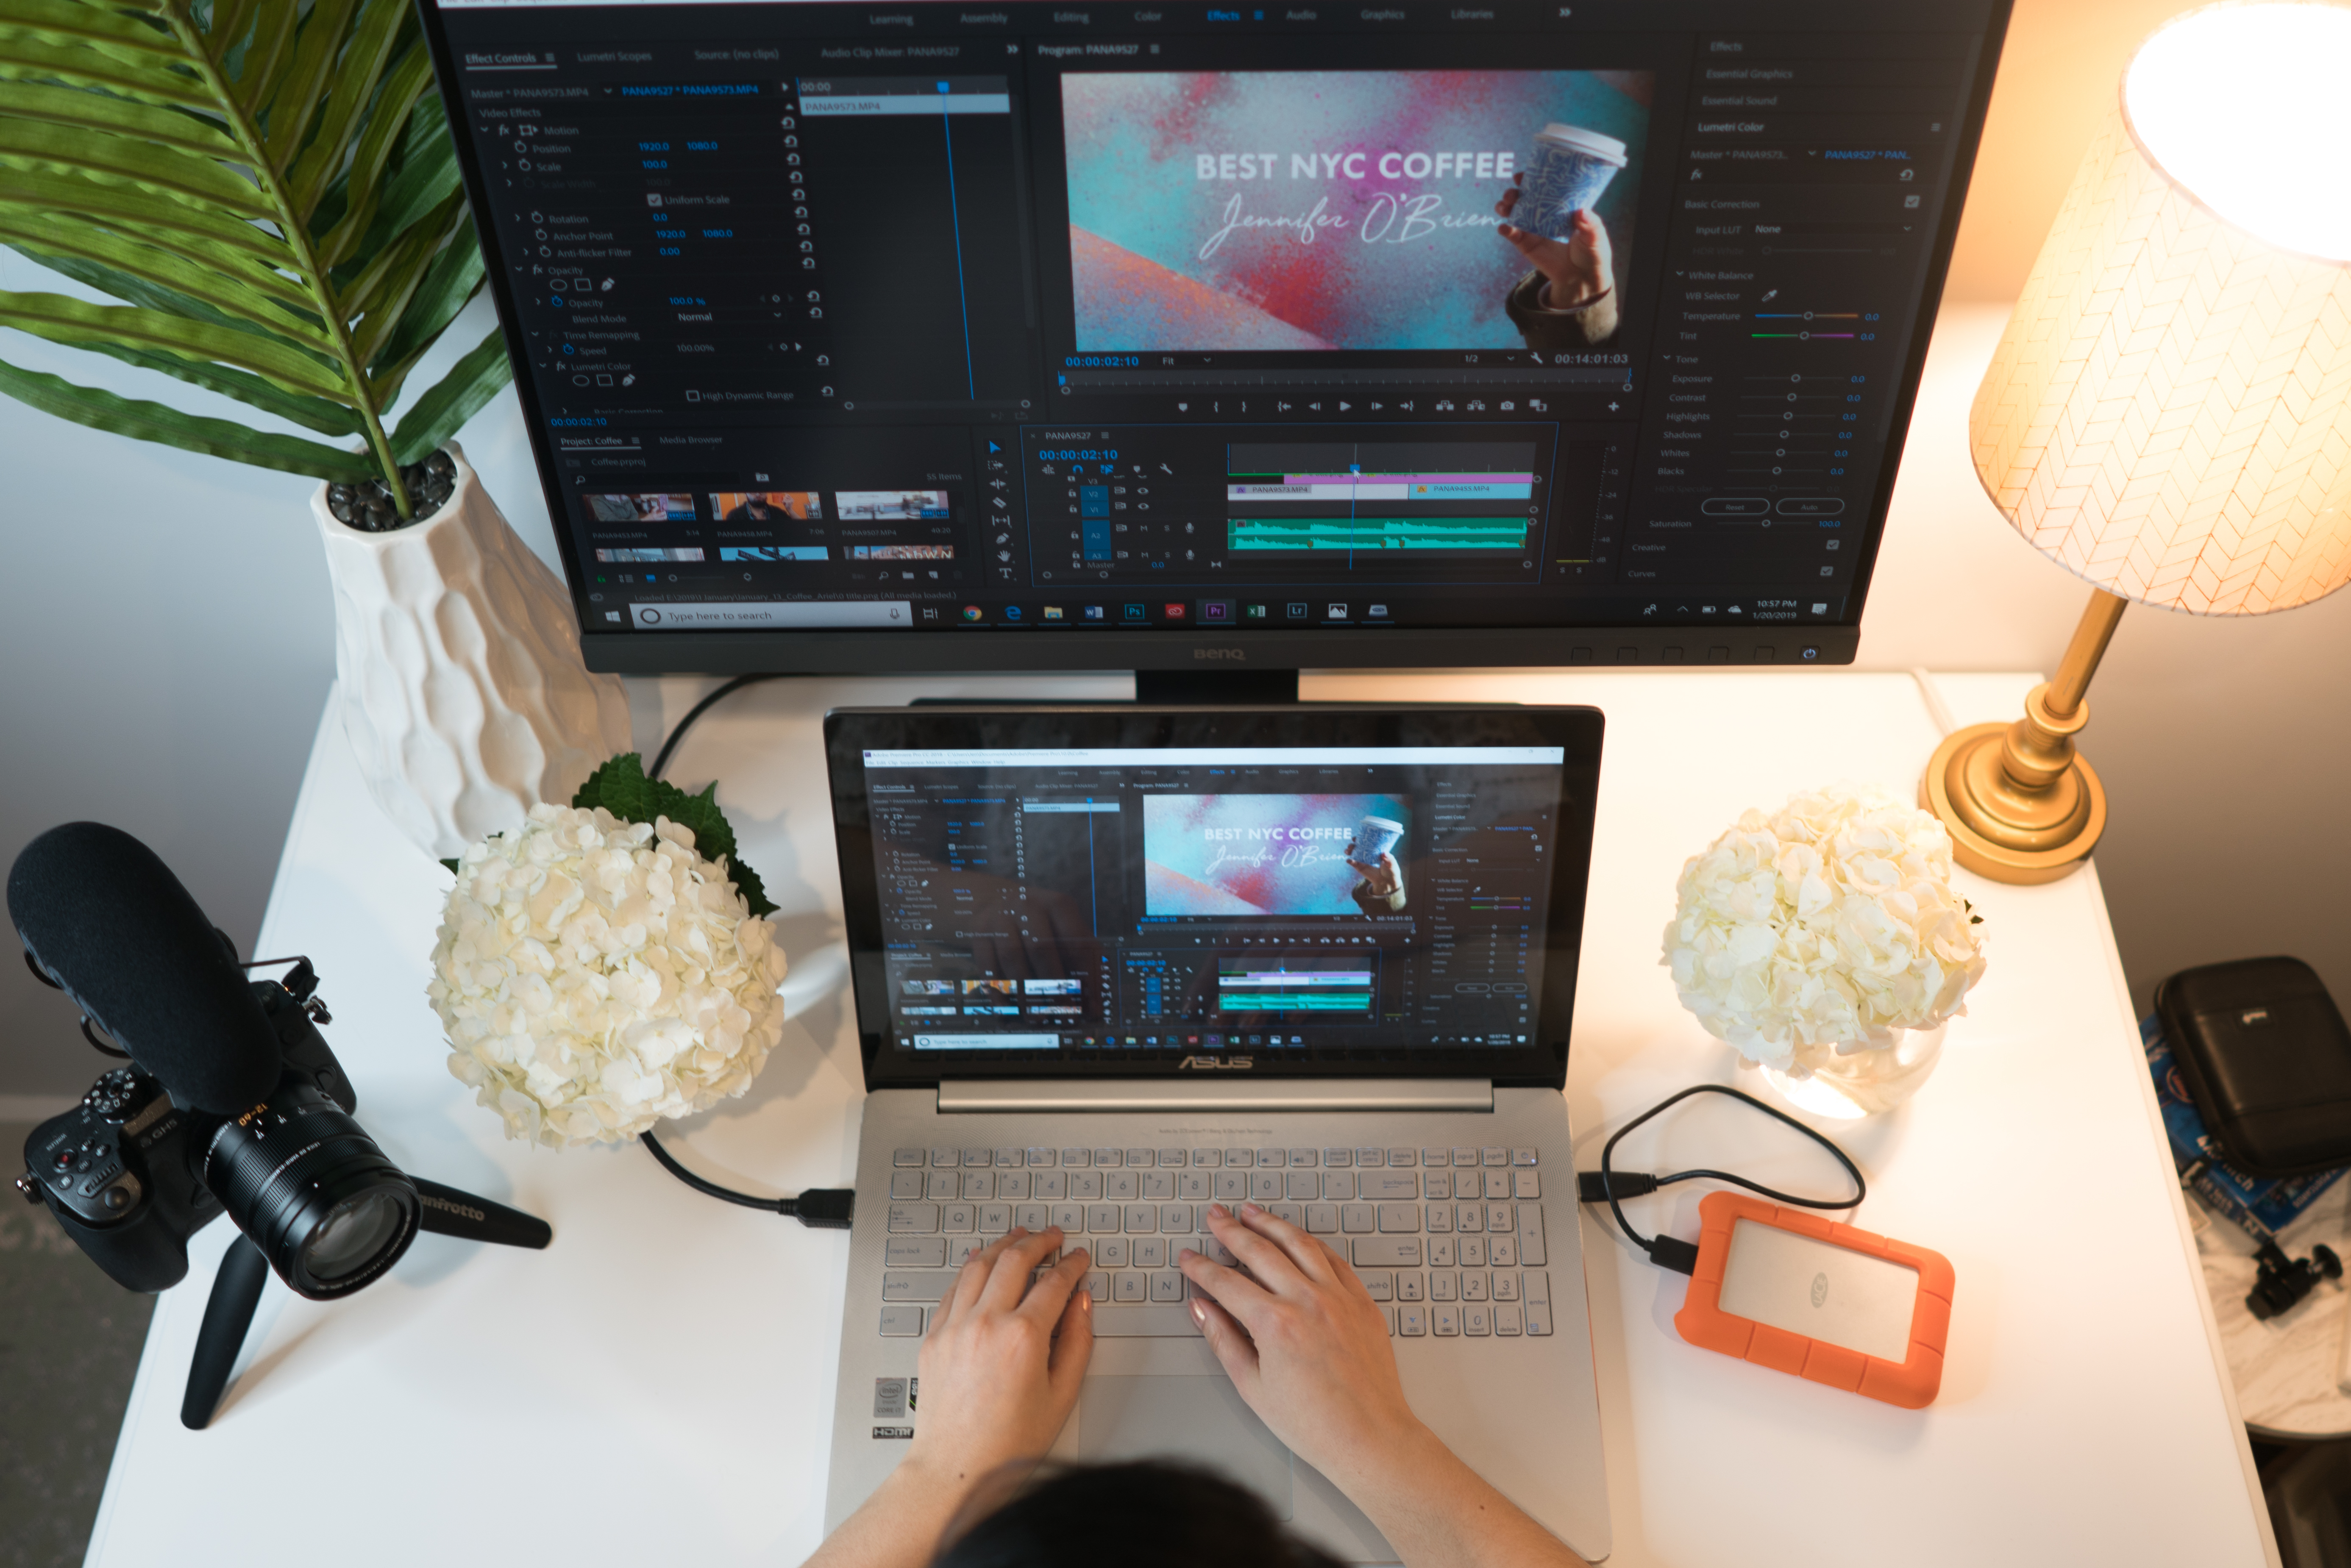 Top video editing mistakes Jennifer O'Brien